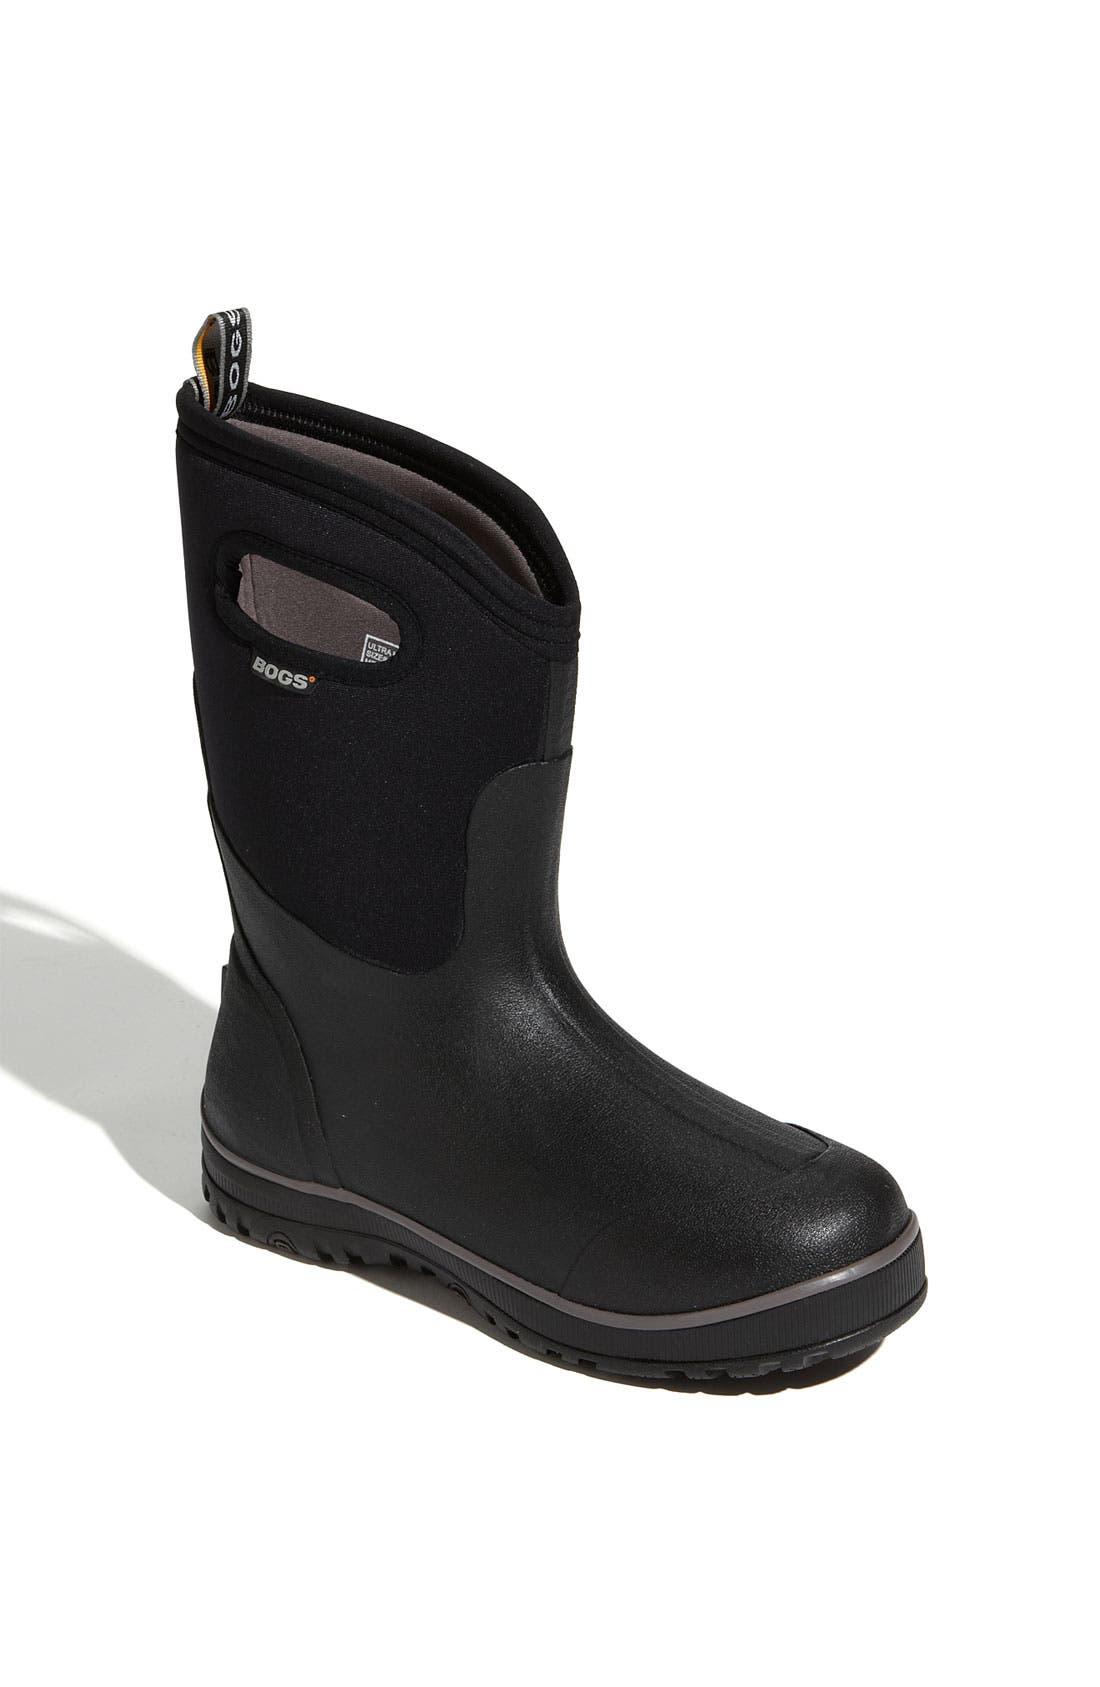 Alternate Image 1 Selected - Bogs 'Classic Ultra' Mid High Rain Boot   (Men)